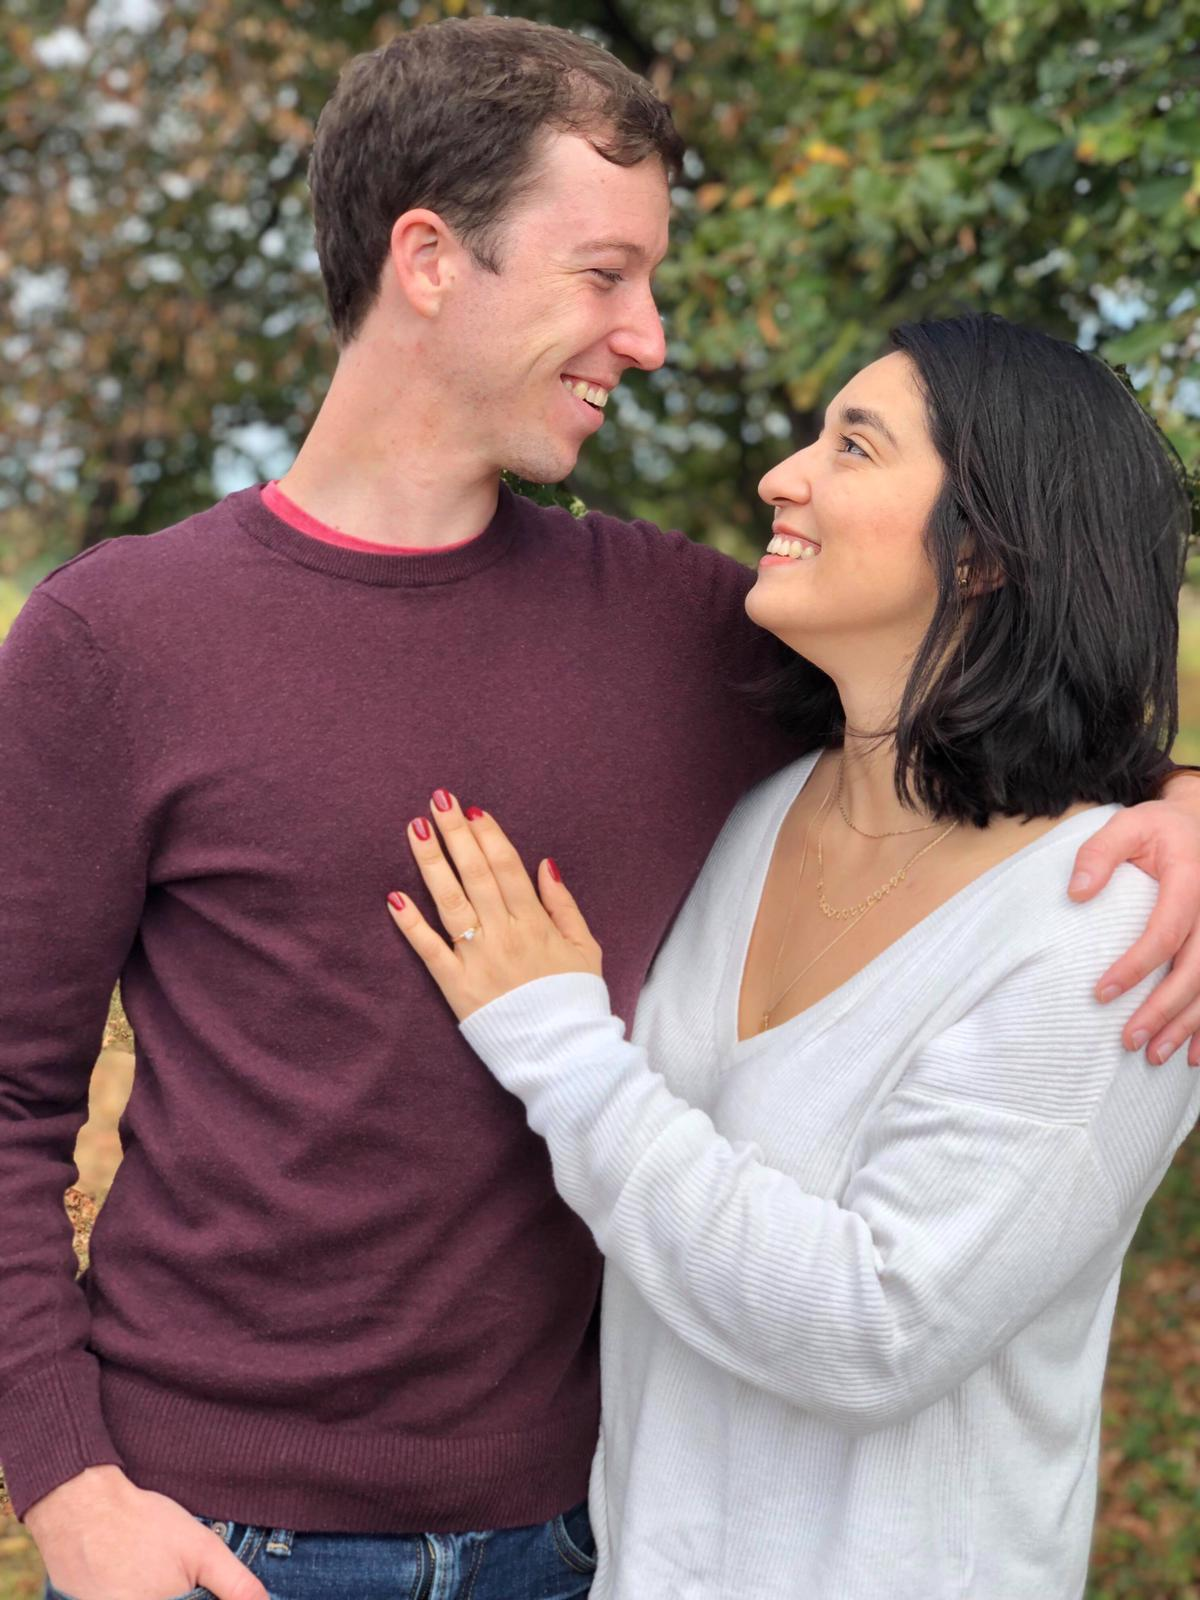 James Marshall & Jacqueline Rojas engagement